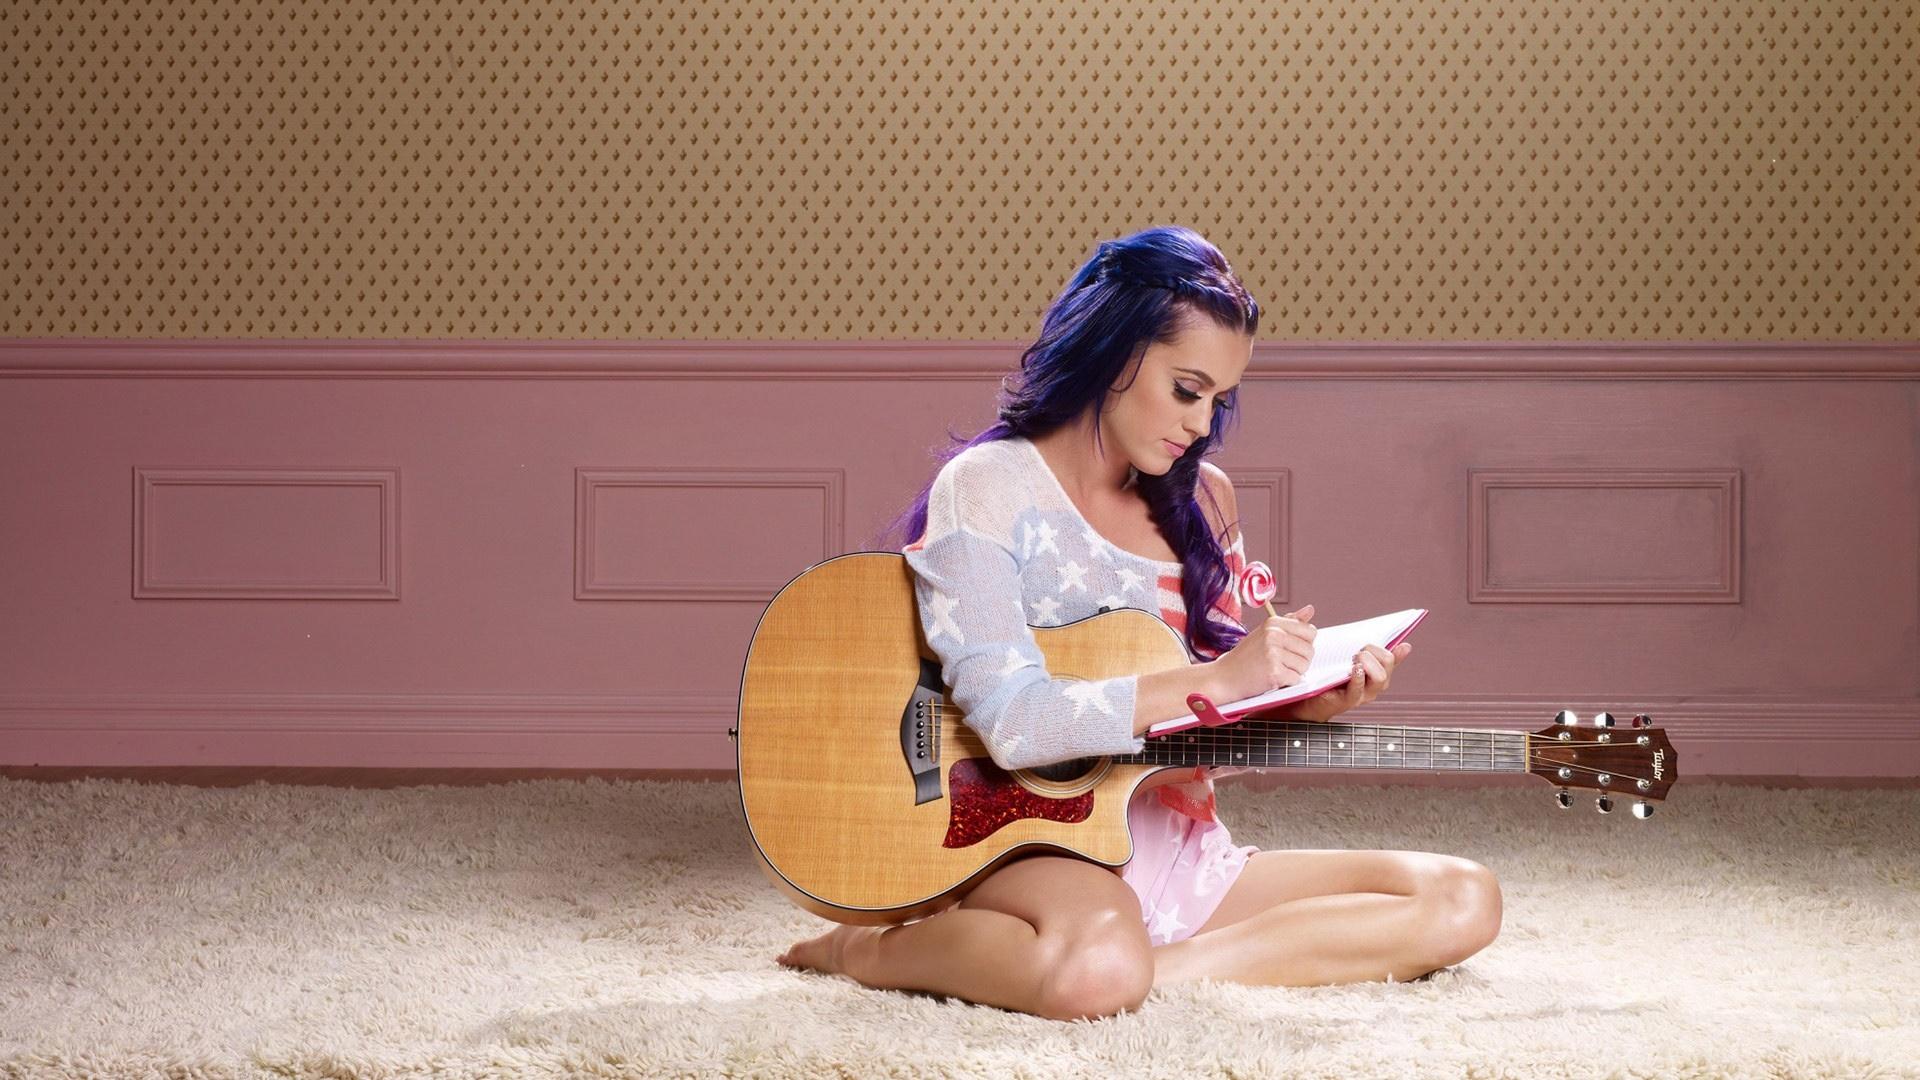 Katy Perry | Cifras de Flauta 2.0 Katy Perry